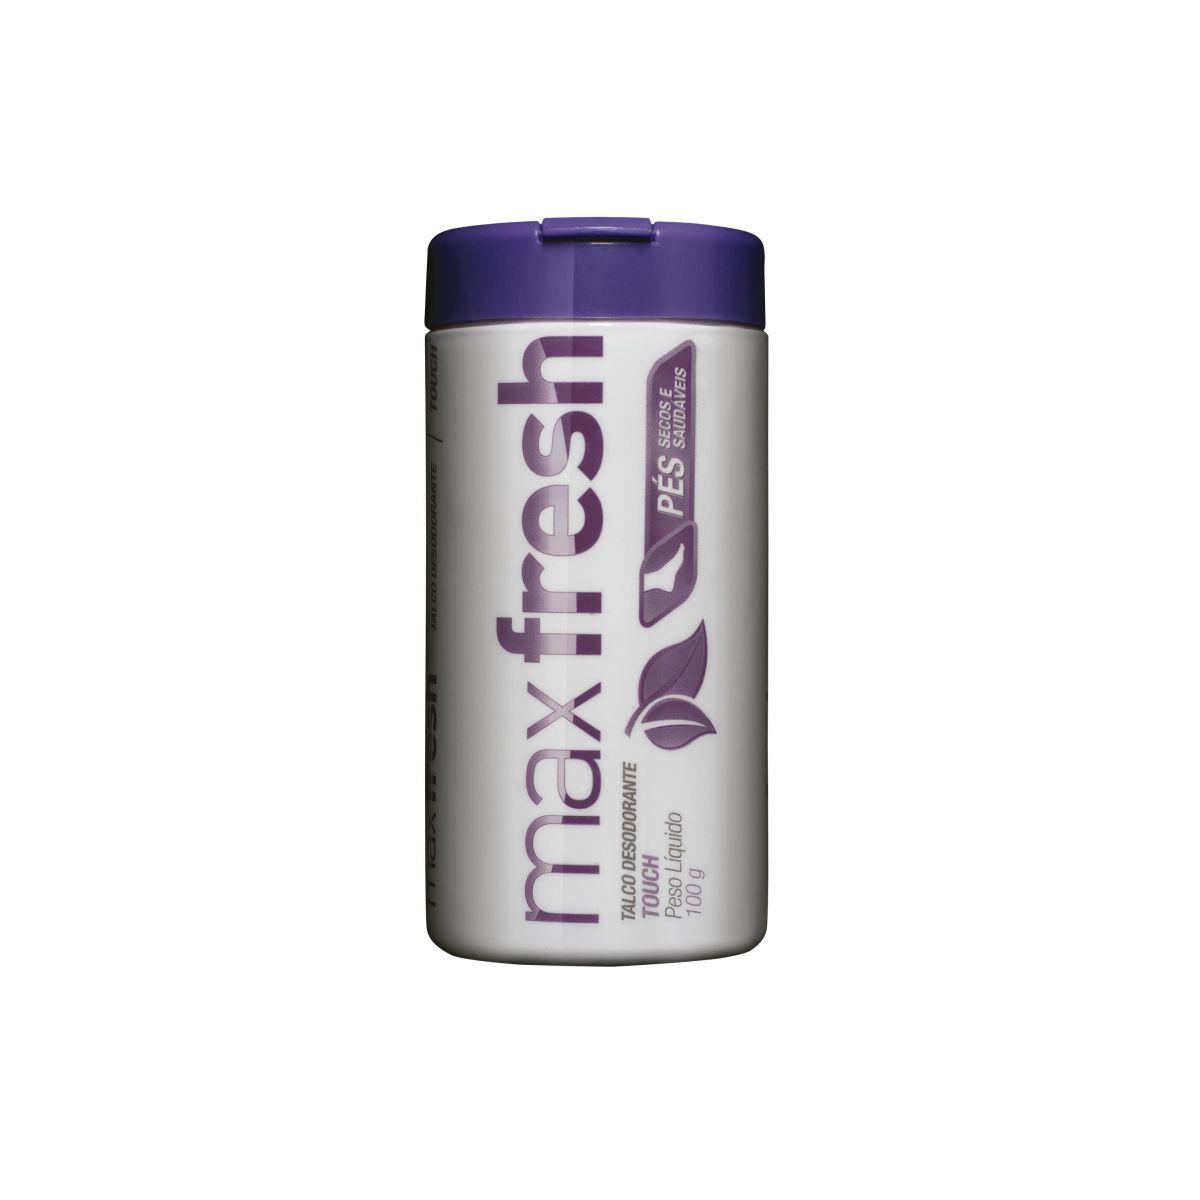 Max Fresh Talco Desodorante Touch 100g  - Saúde Compras